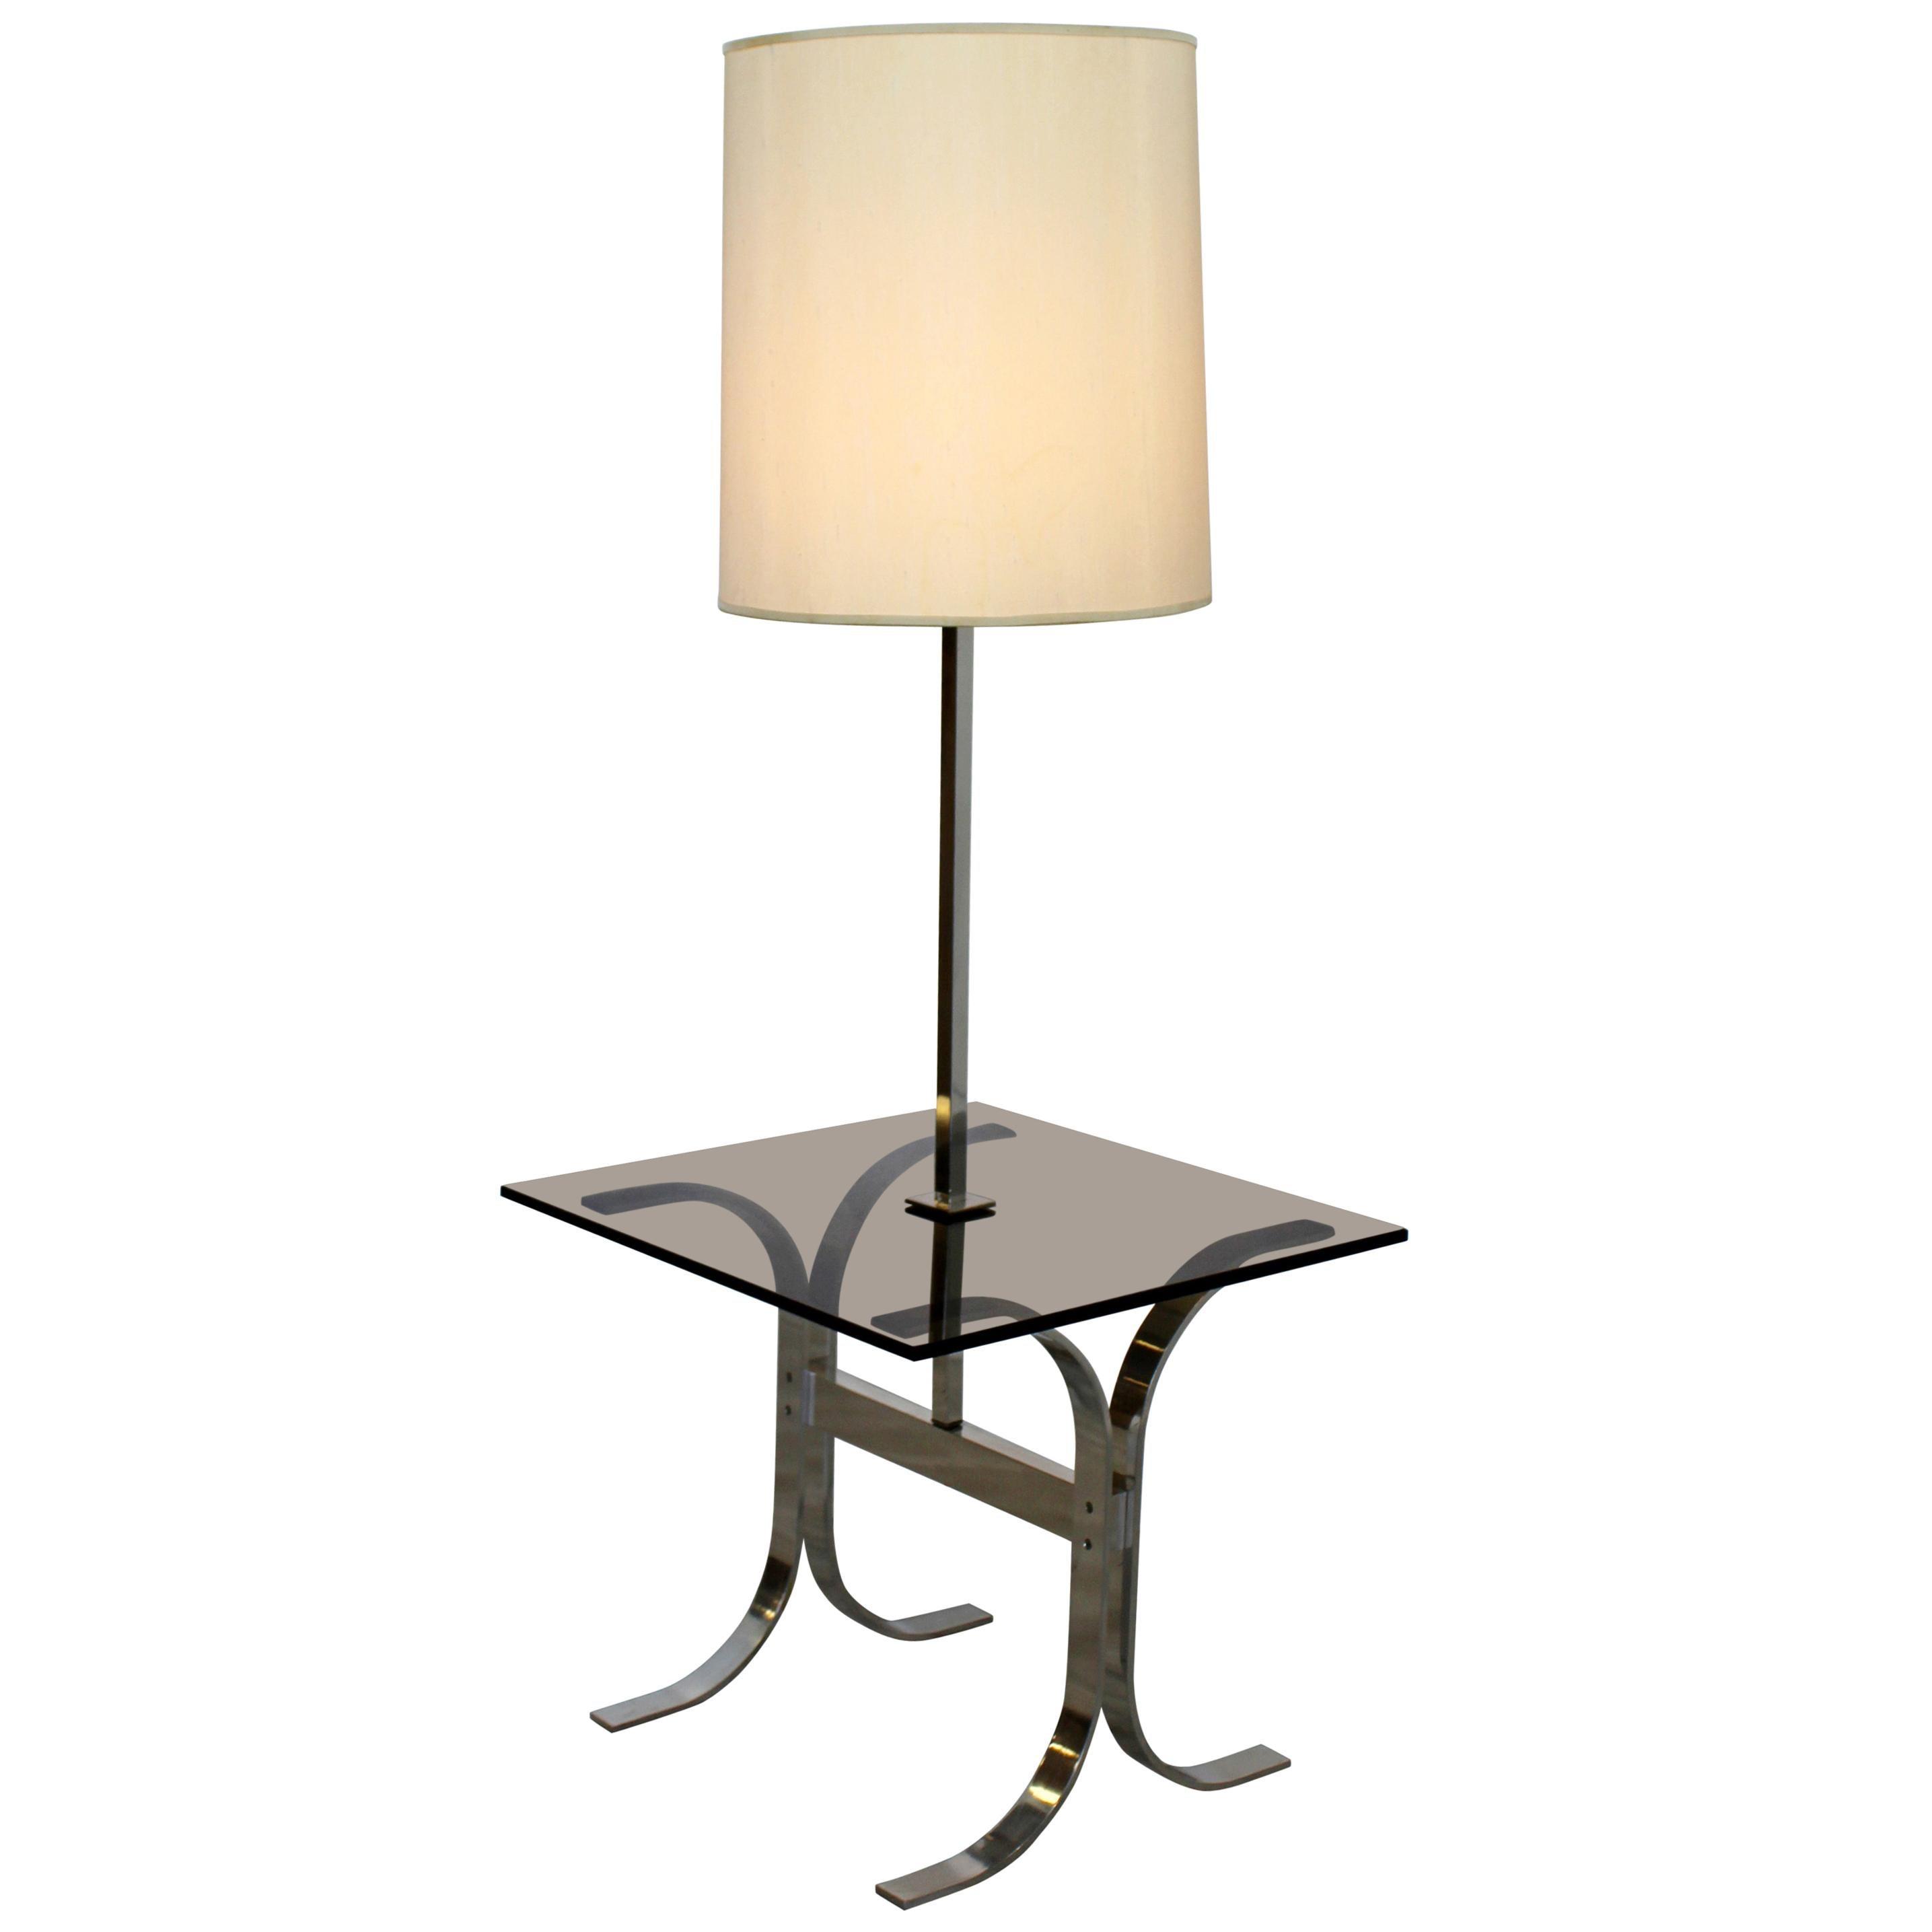 Mid-Century Modern Chrome Smoked Glass Floor Lamp Table Laurel, 1970s